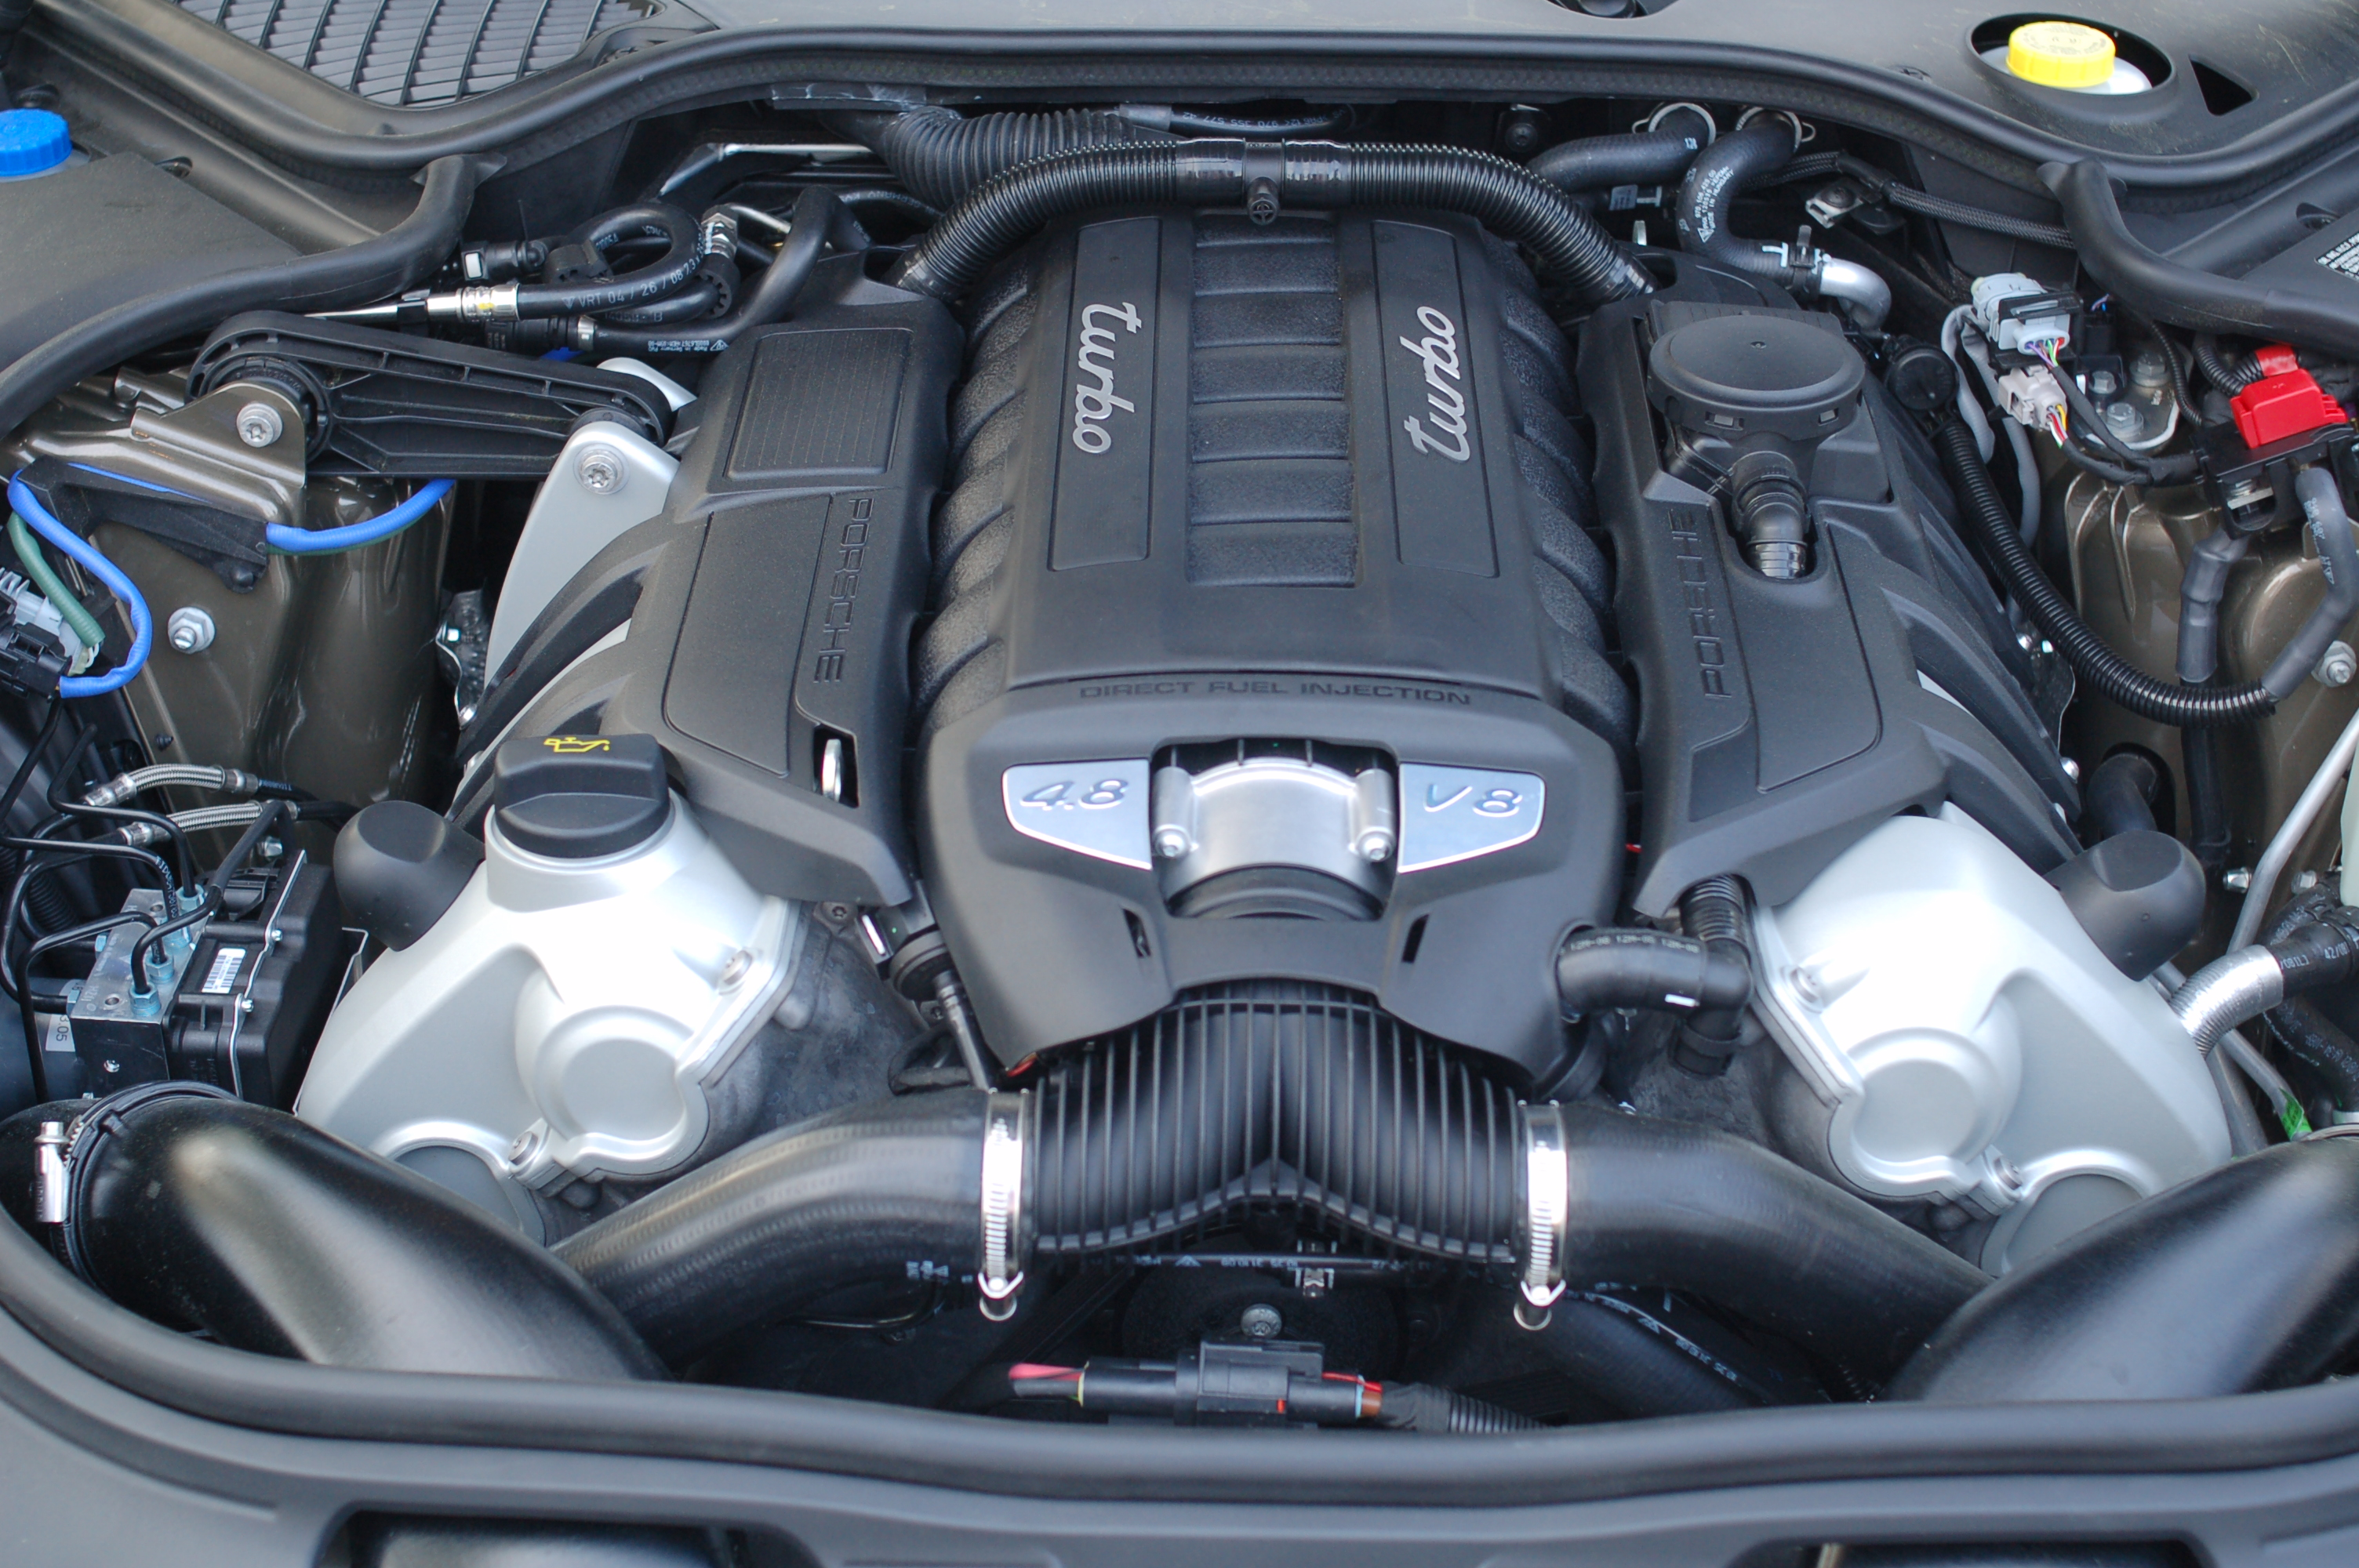 Supercharged Twin Turbo v8 Panamera Turbo 4.8l v8 Twin